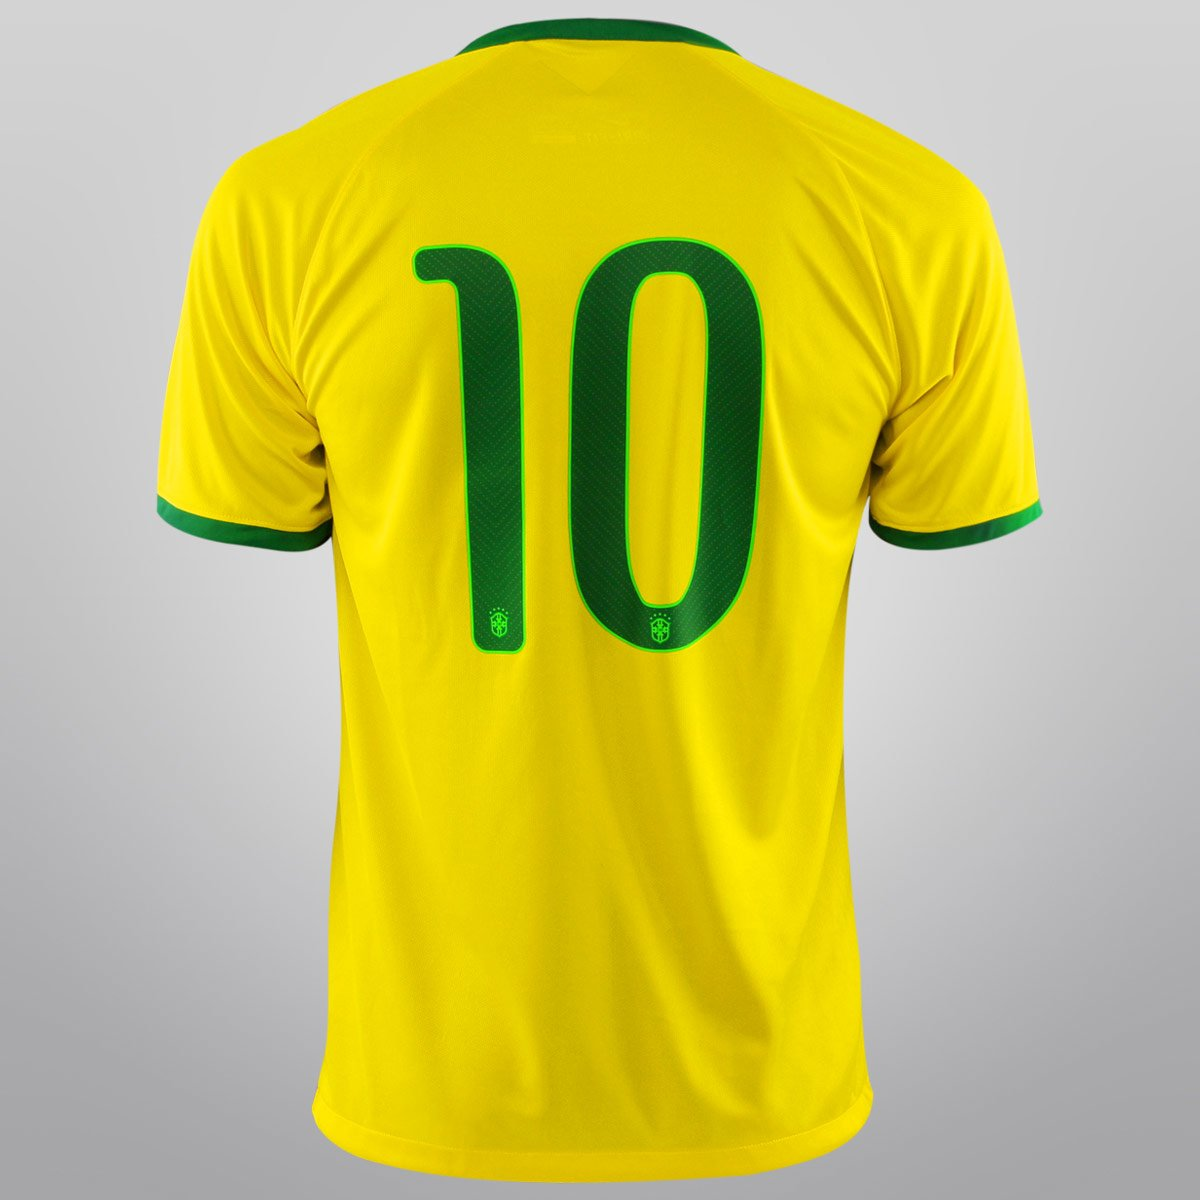 afe7228053 Camisa Seleção Brasil I 14 15 nº 10 - Torcedor Nike Masculina ...